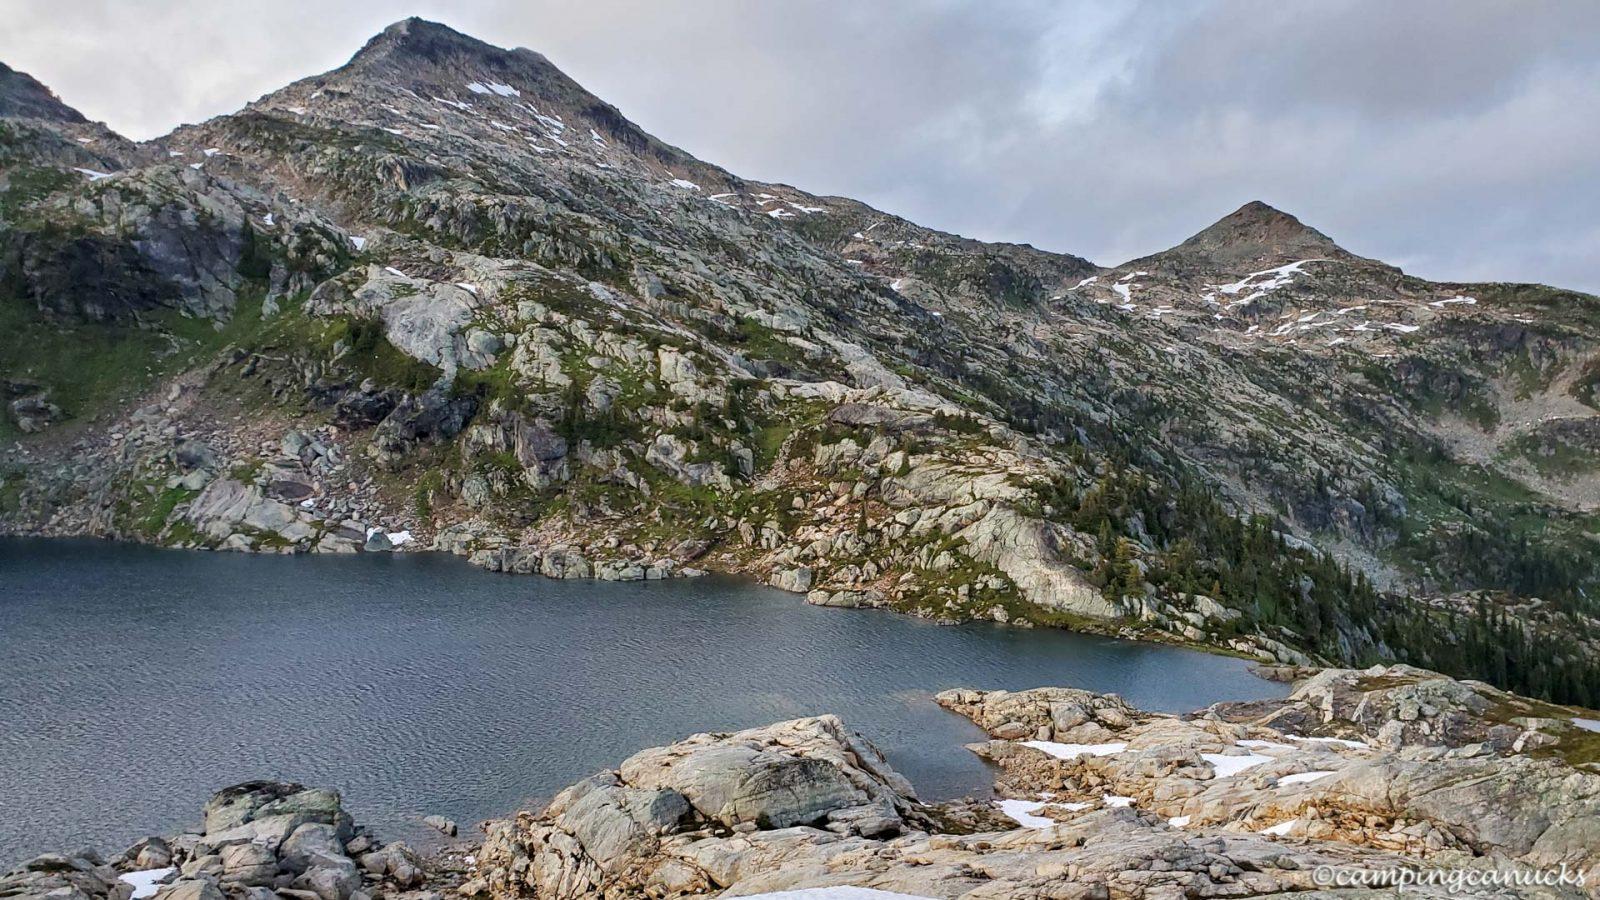 Wavy Crest Peak